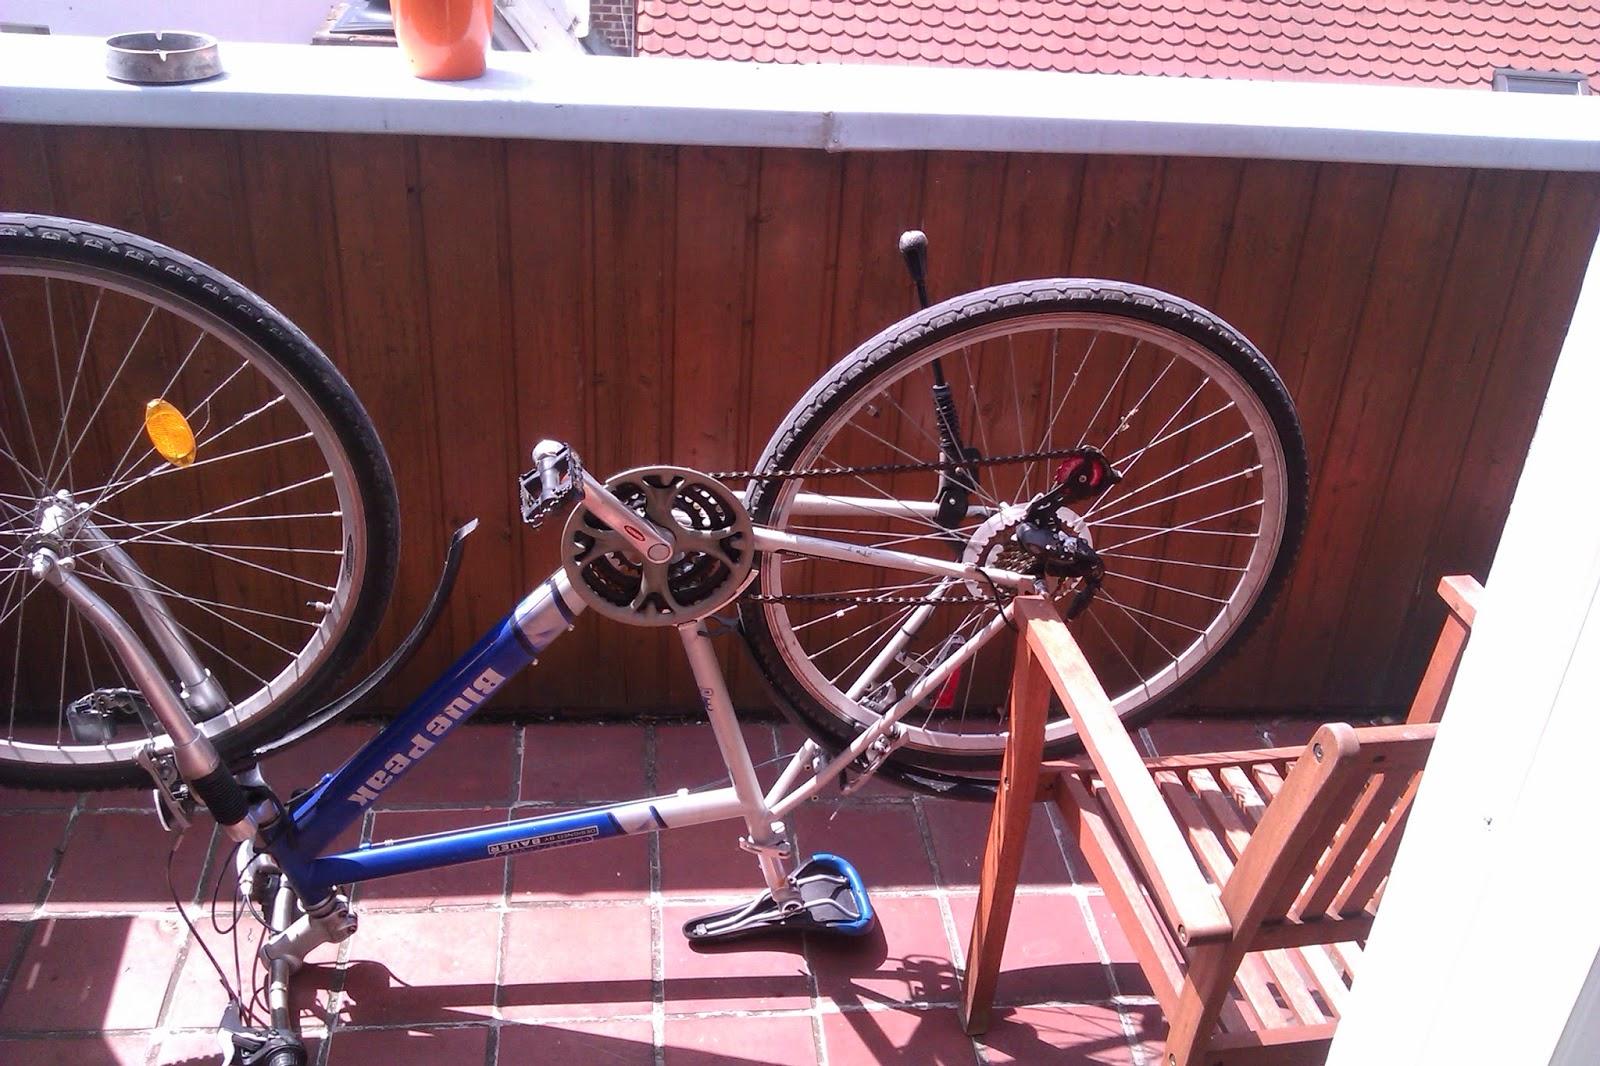 gear change mending repairing tire change